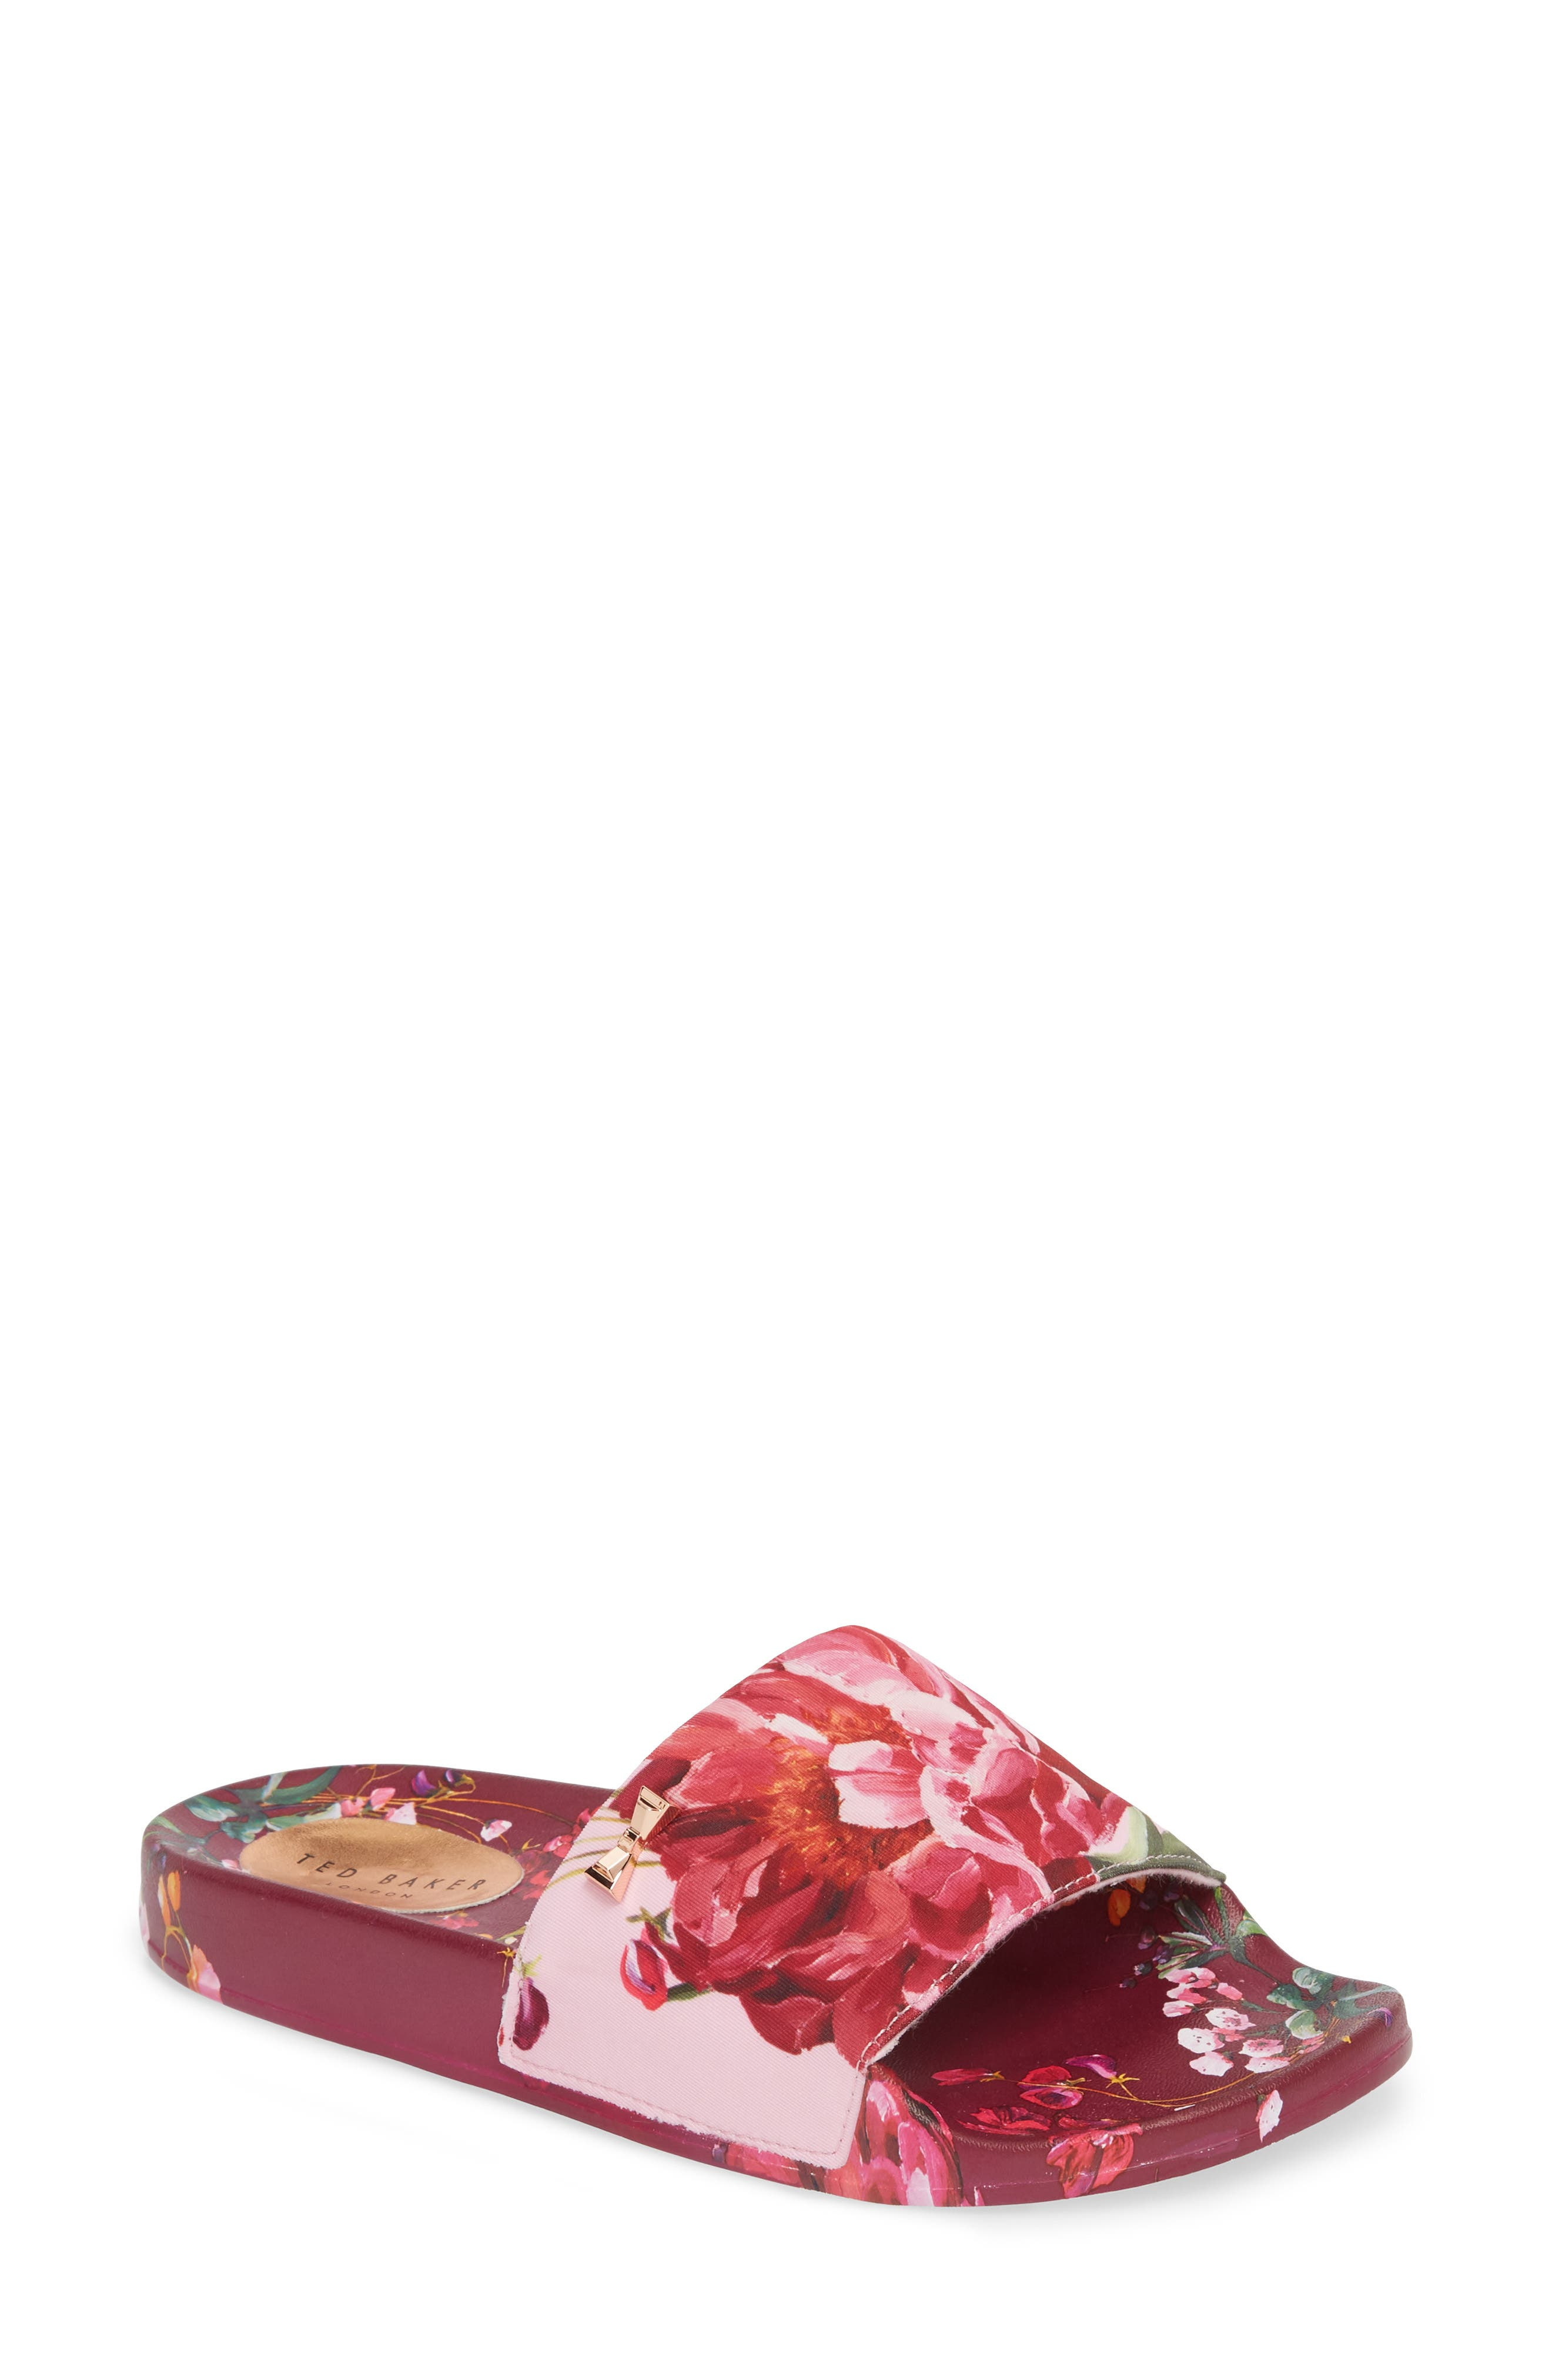 Qarla Slide Sandal,                             Main thumbnail 1, color,                             650